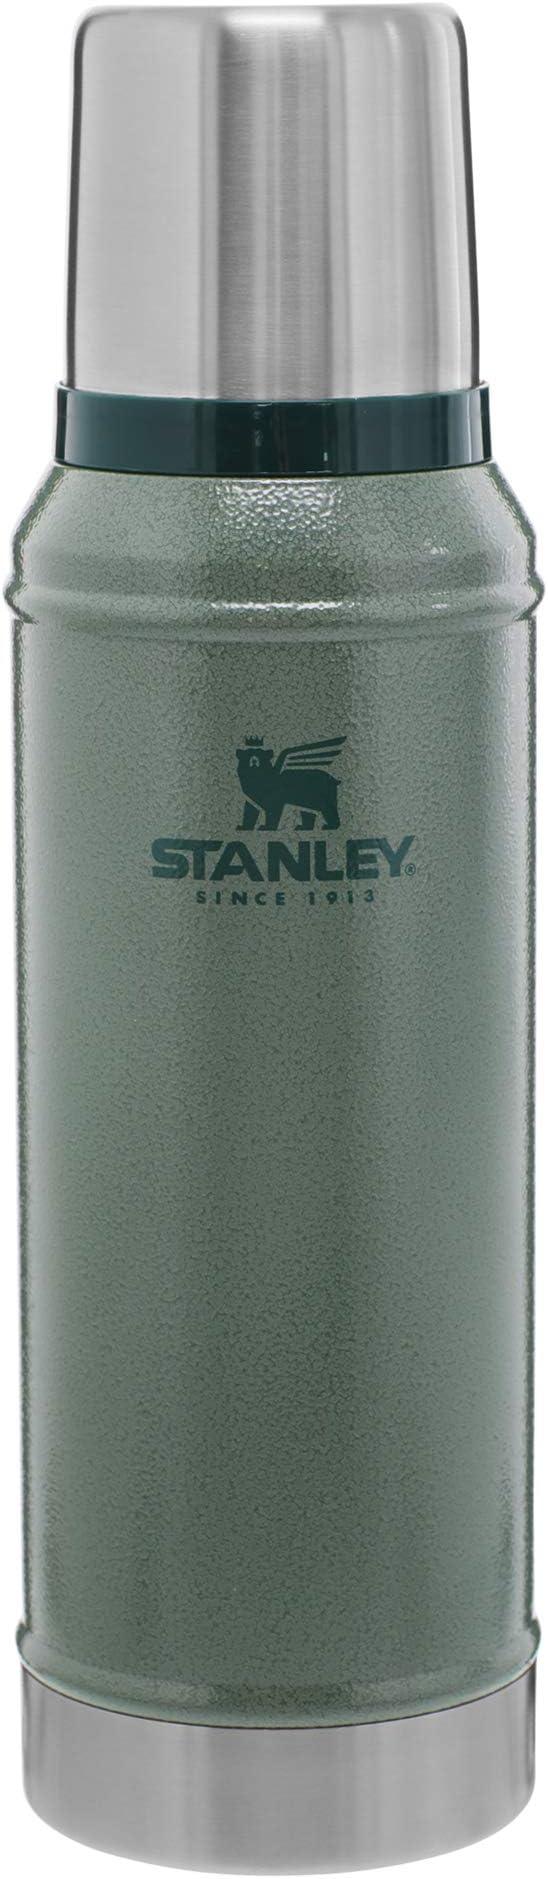 Stanley Classic Legendary Vacuum Insulated Bottle Hammertone Green 1.0qt